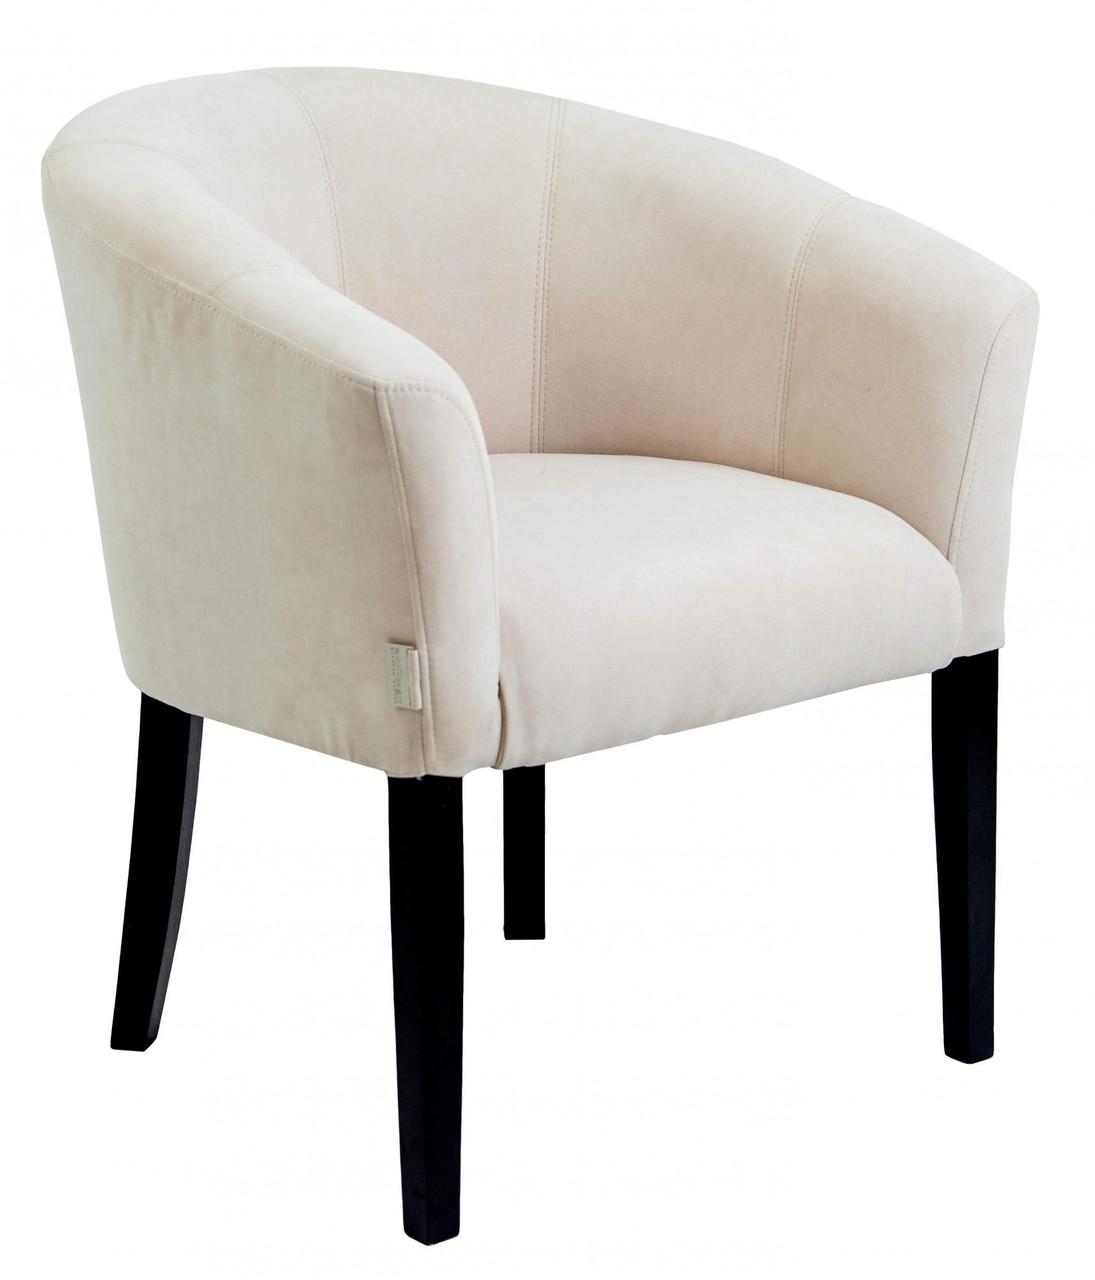 Кресло Richman Версаль 65 x 65 x 75H Fibril 05 Бежевое